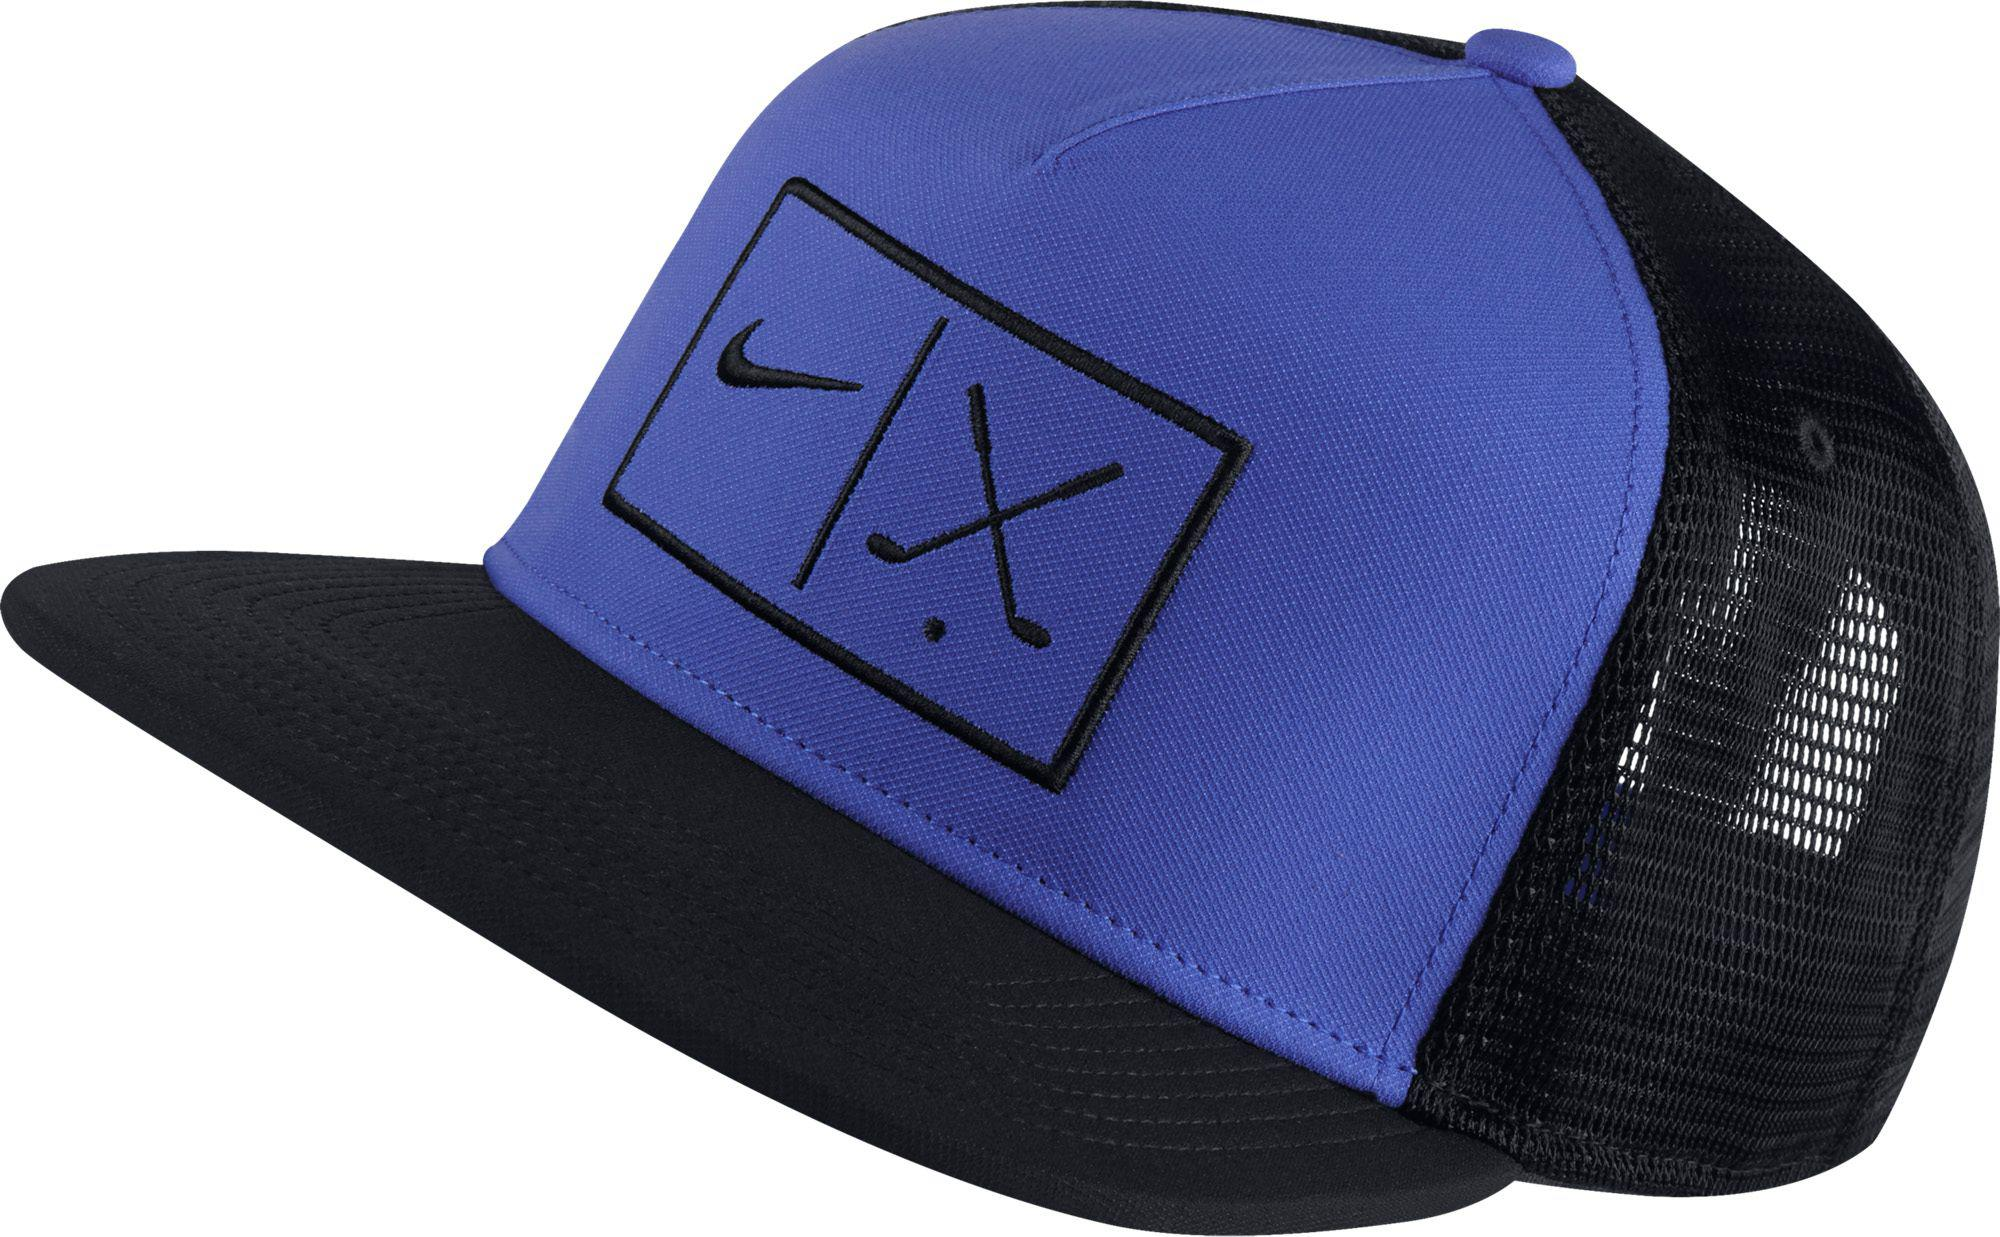 Lyst - Nike True Novelty Golf Hat in Blue for Men d2c311c2c1d